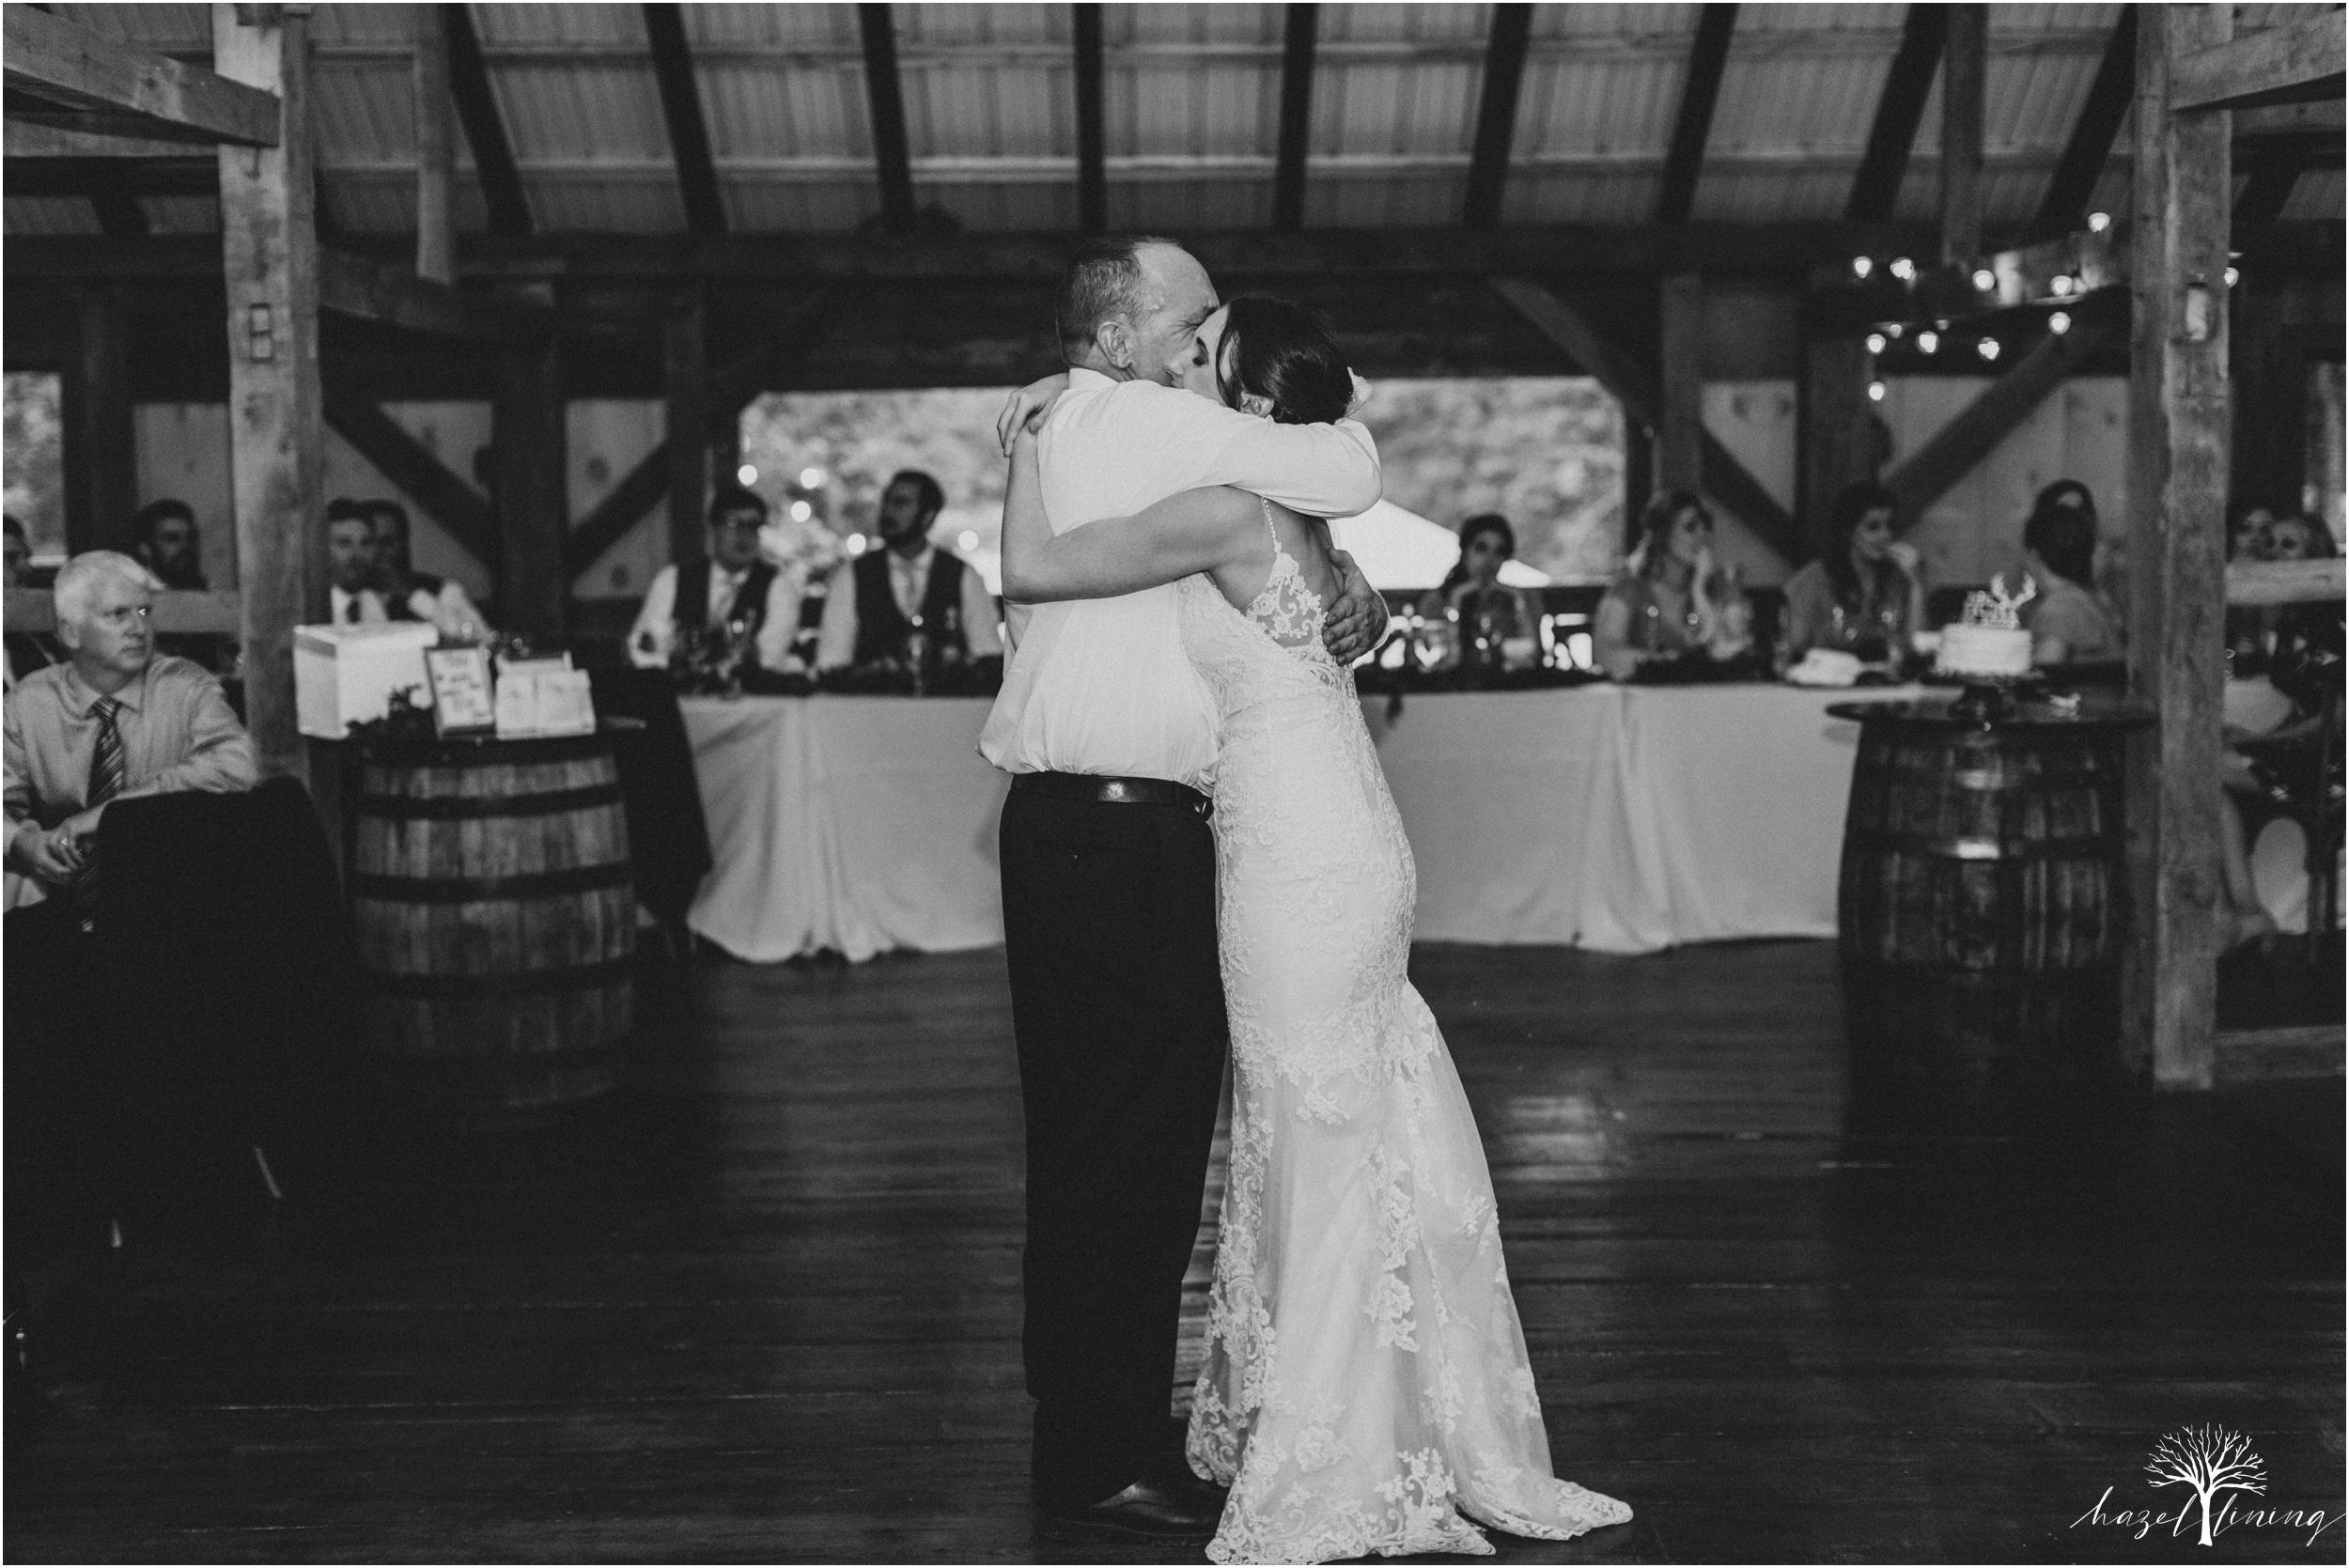 hazel-lining-travel-wedding-elopement-photography-lisa-landon-shoemaker-the-farm-bakery-and-events-bucks-county-quakertown-pennsylvania-summer-country-outdoor-farm-wedding_0128.jpg